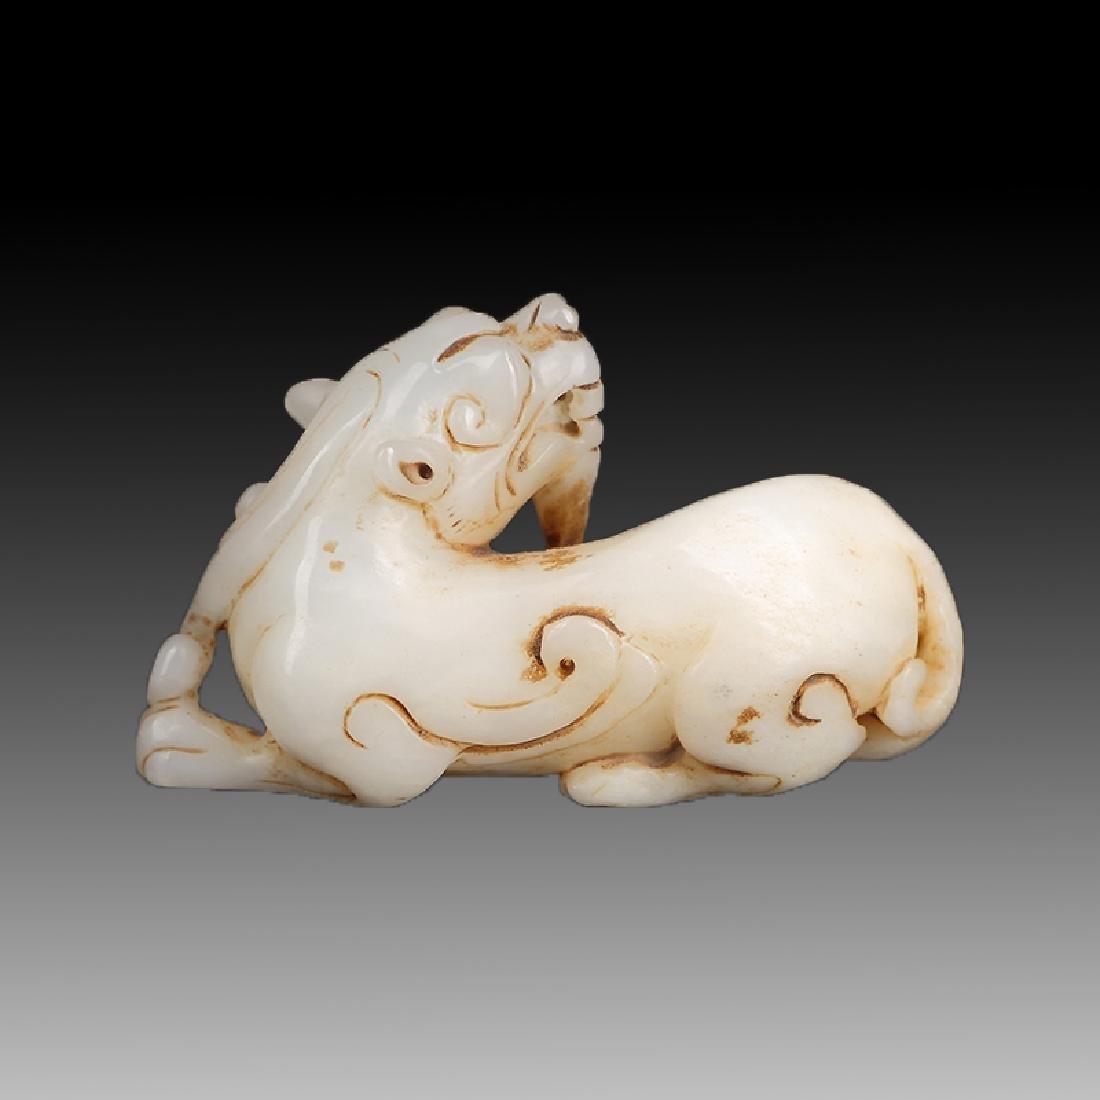 Chinese Qing Dynasty Hetian Jade Statue Pixiu